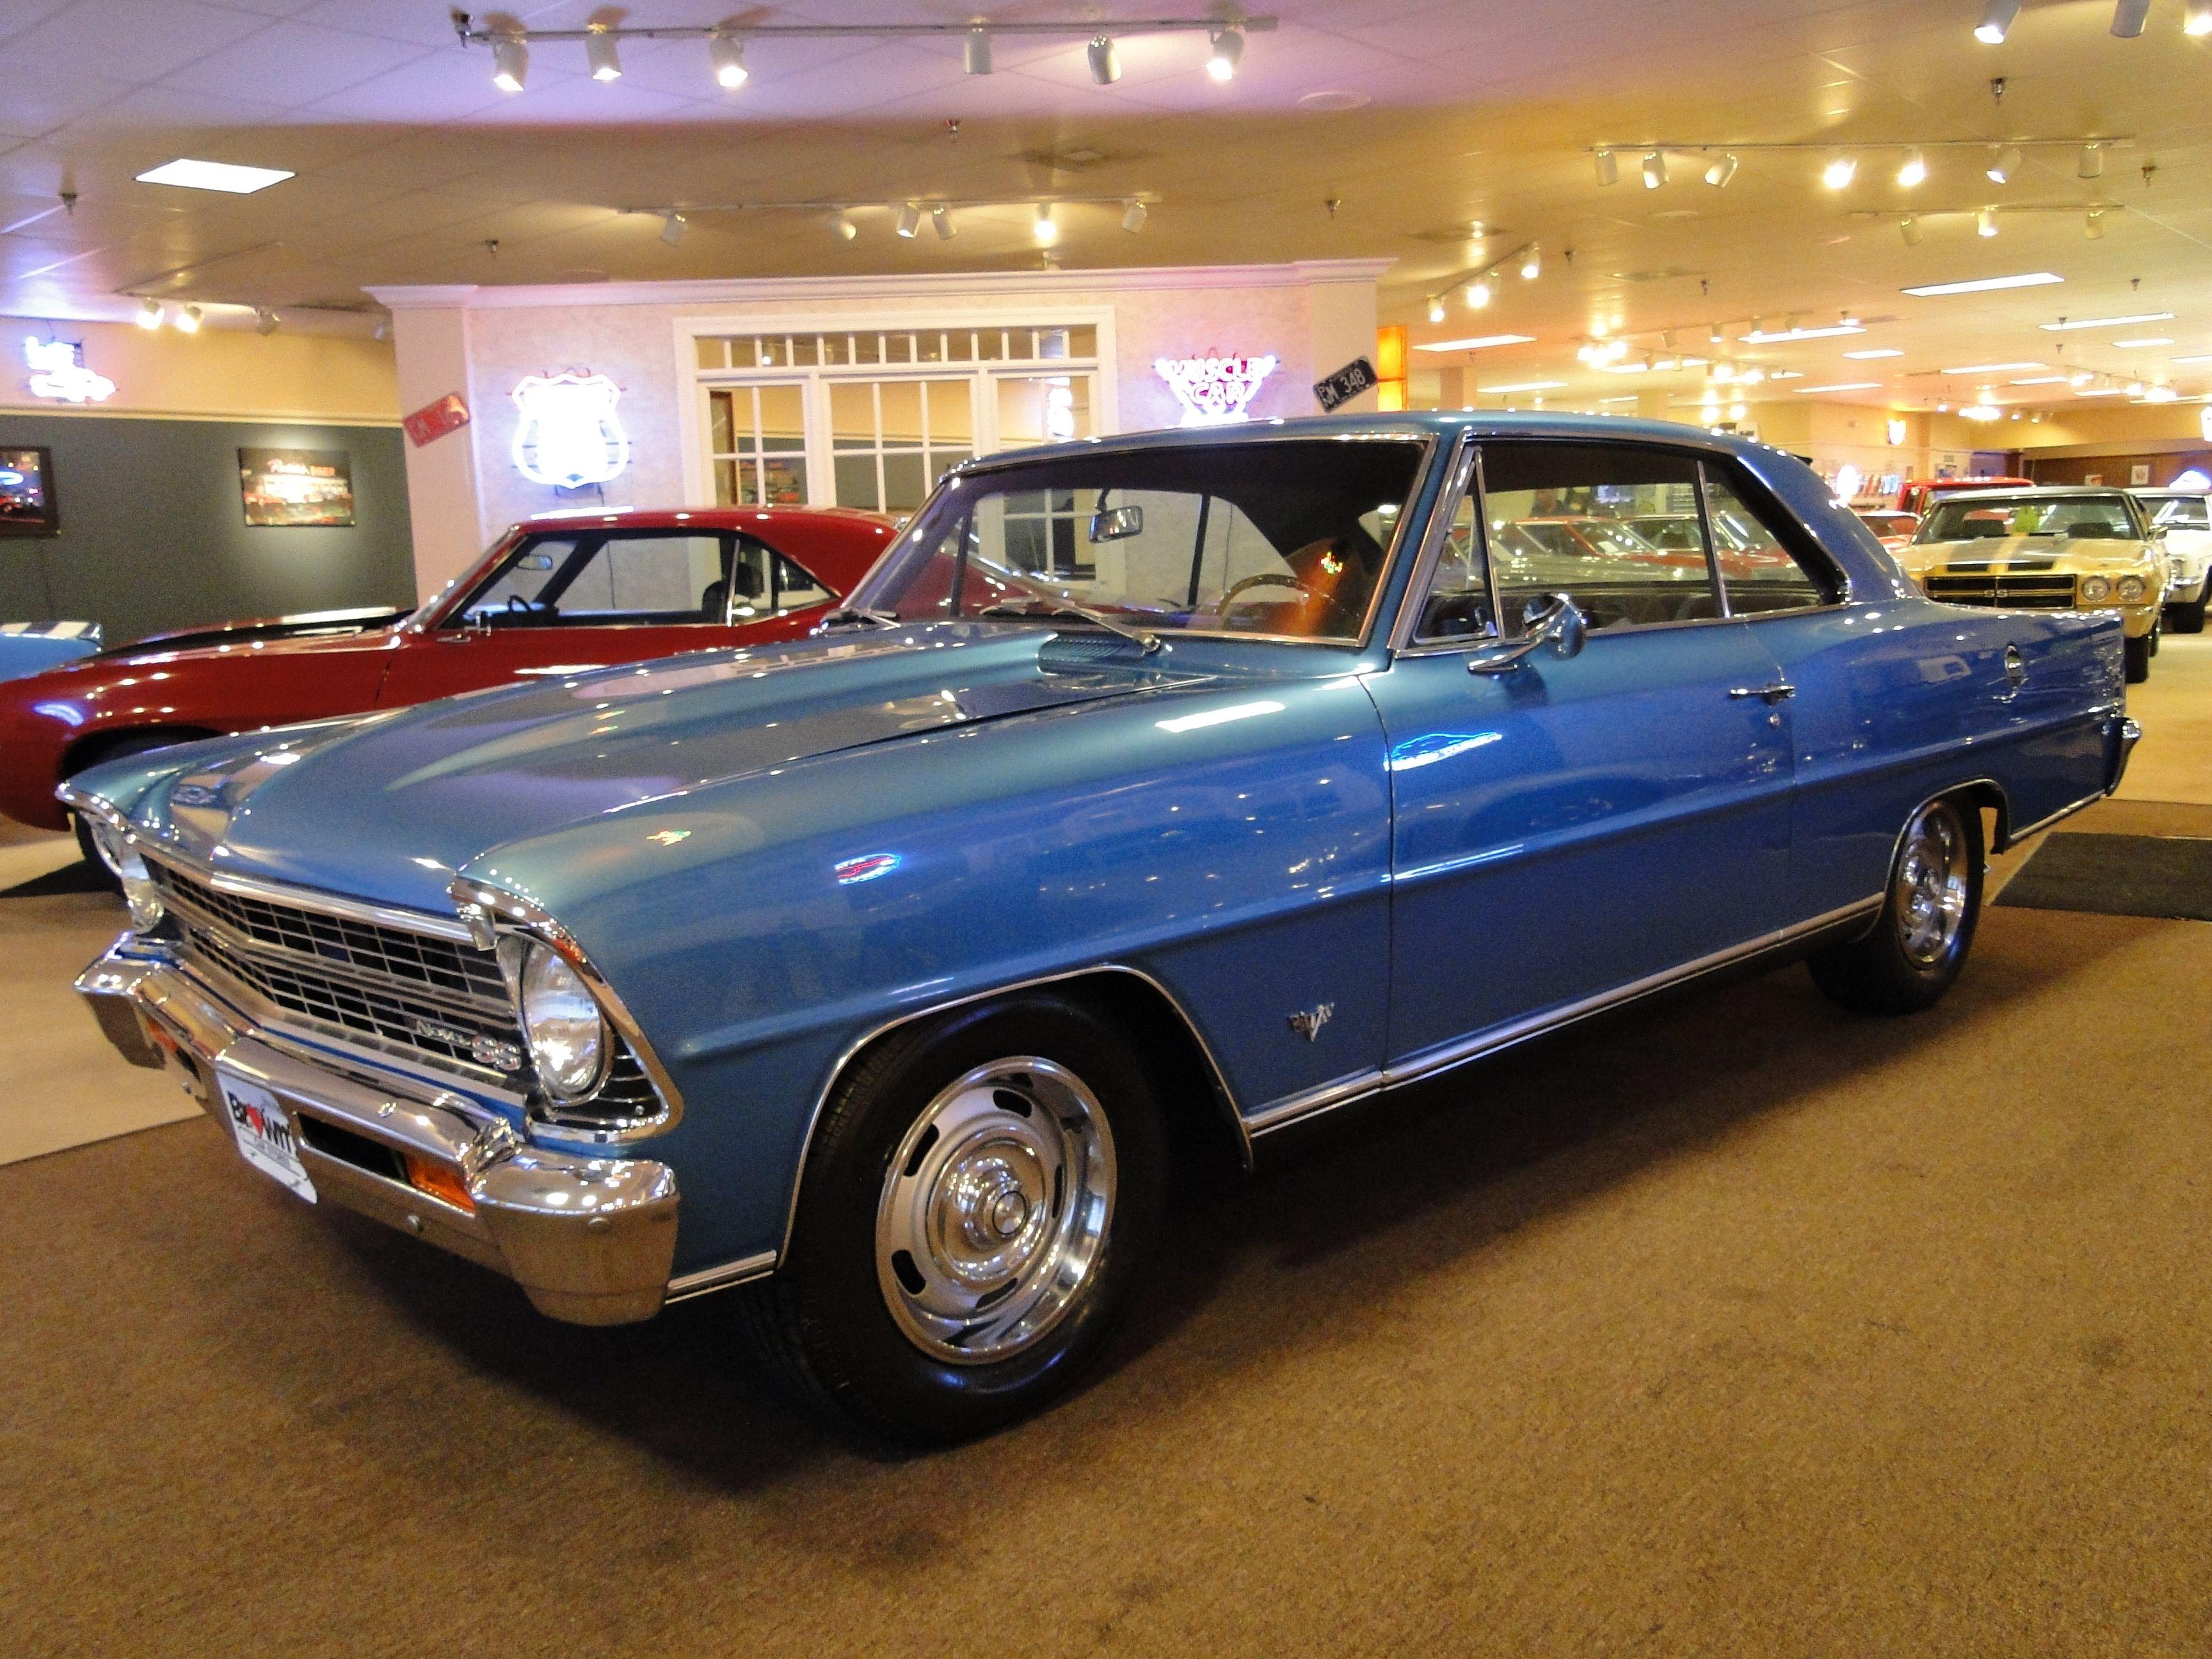 1967 chevy nova ss for sale | New 1967 Chevrolet Nova SS Numbers ...